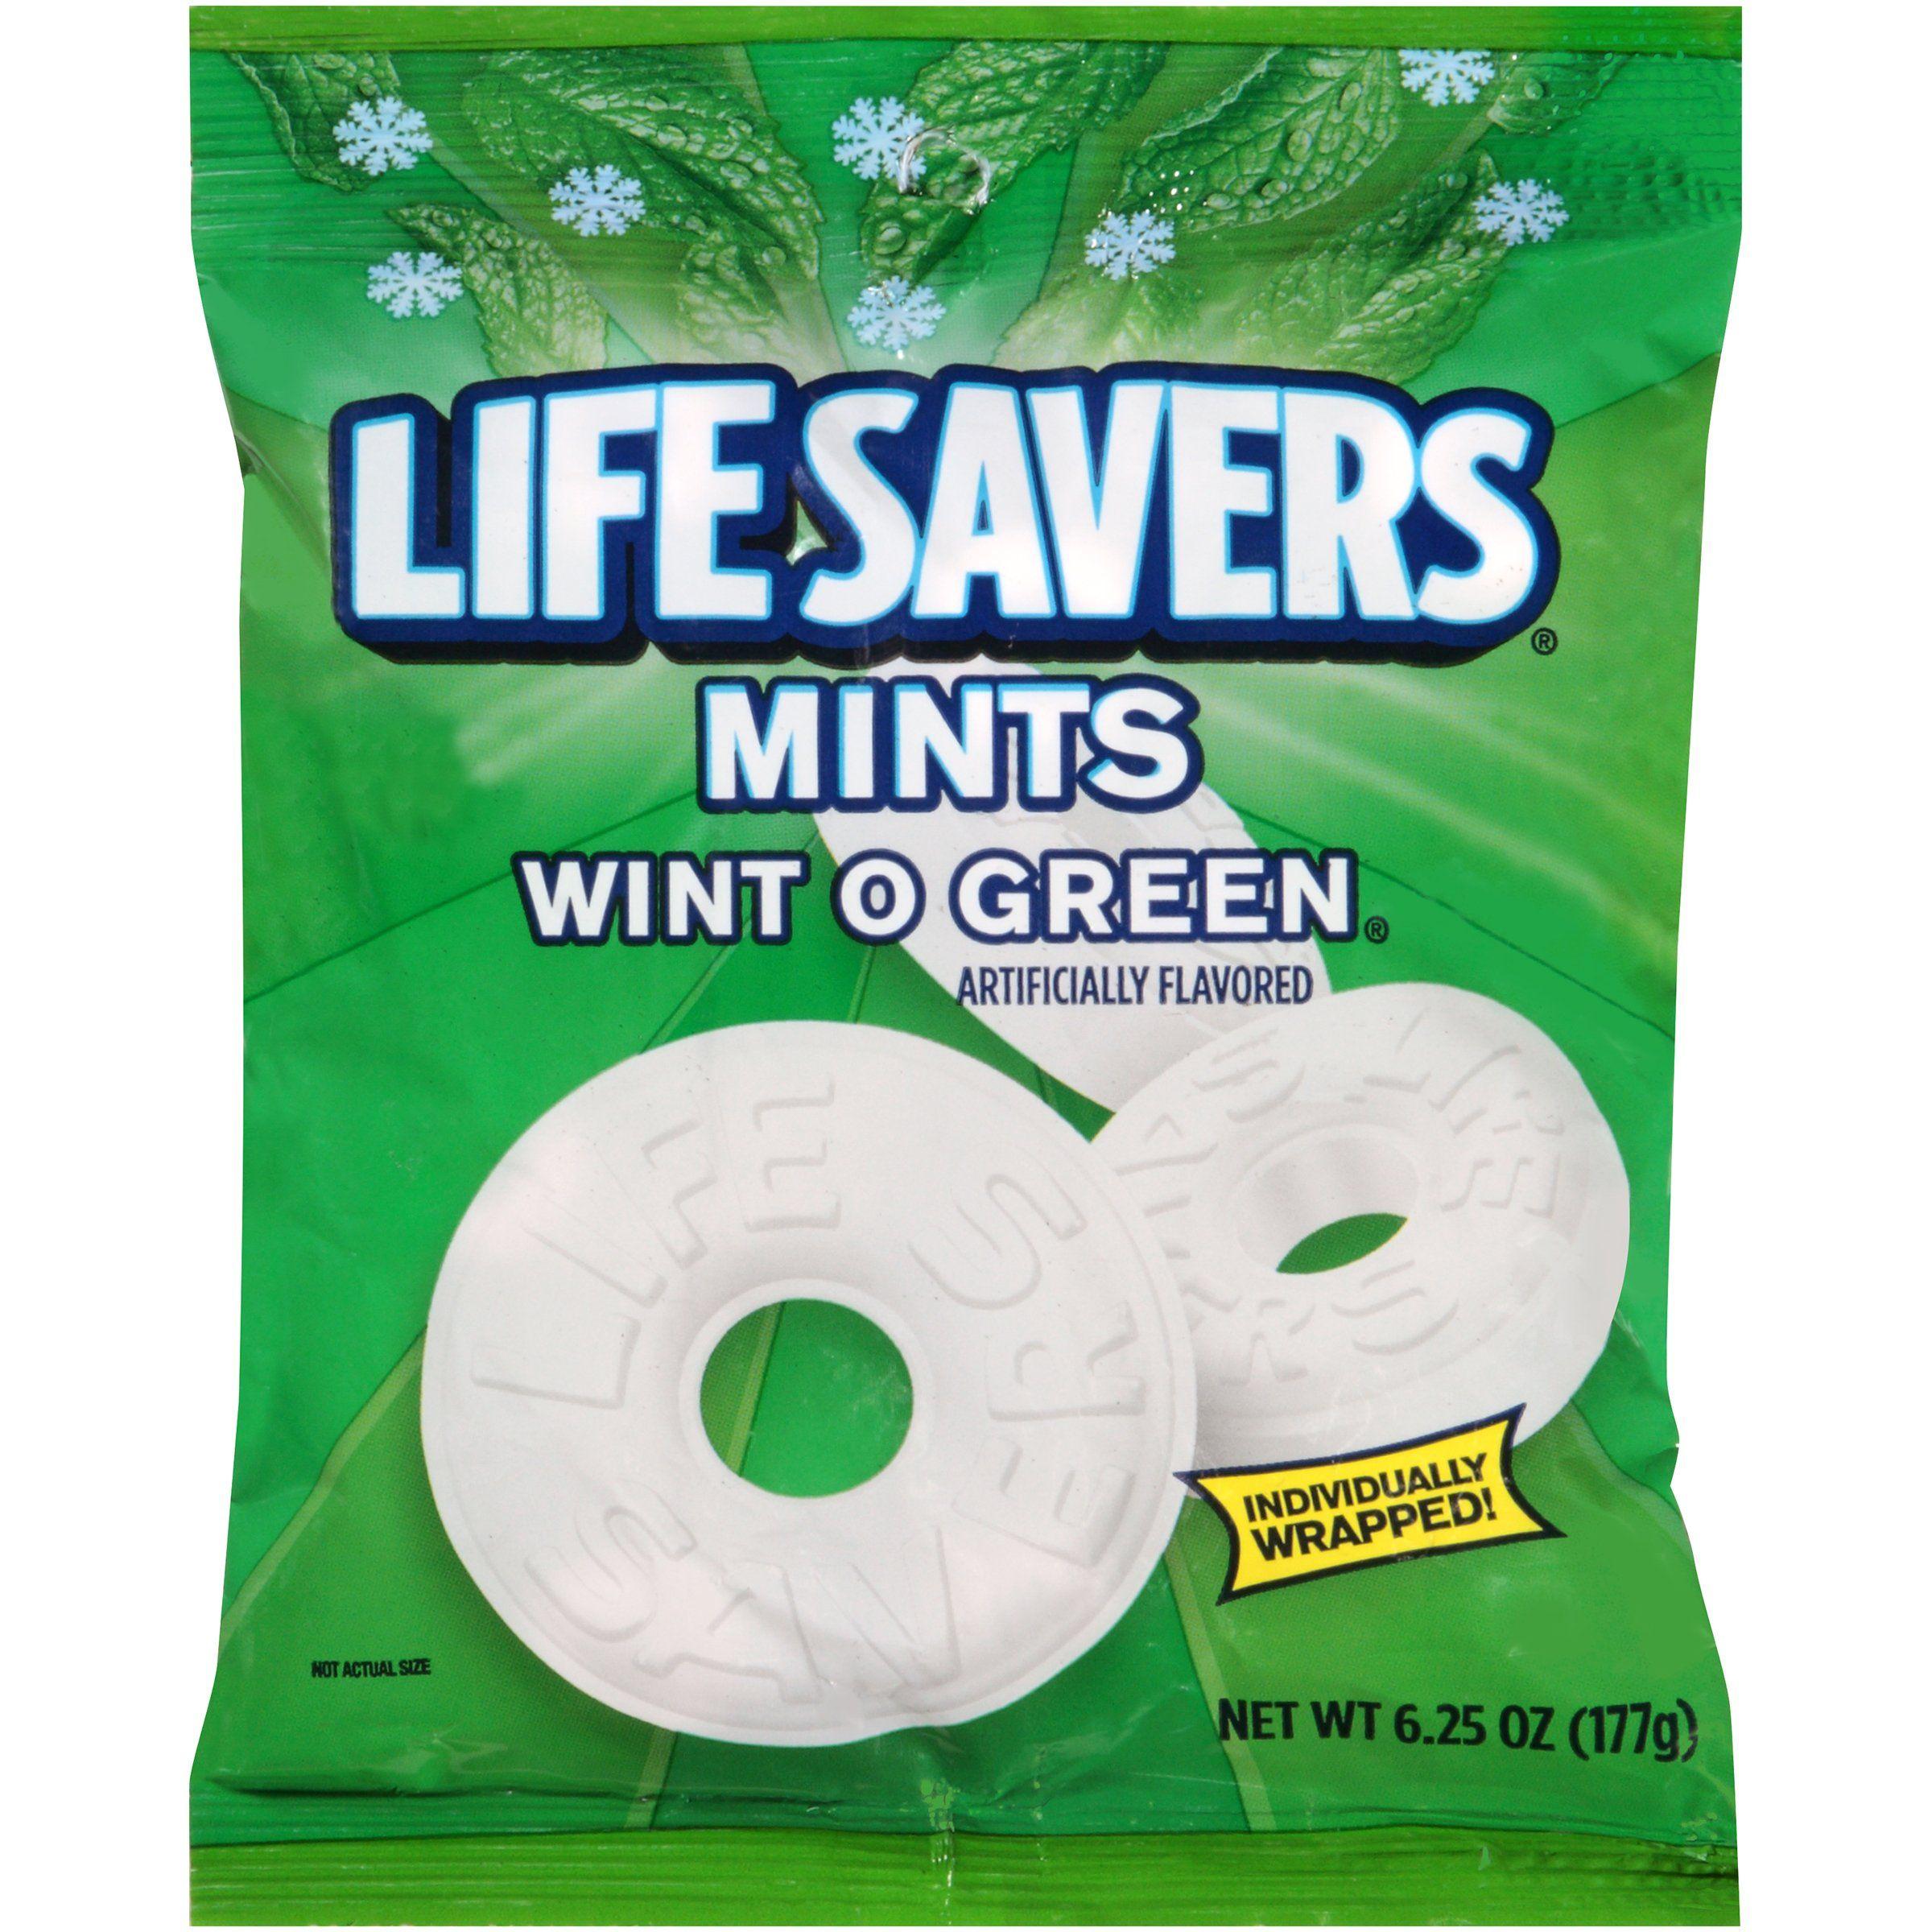 Lifesavers wintogreen mints mint candy hard candy